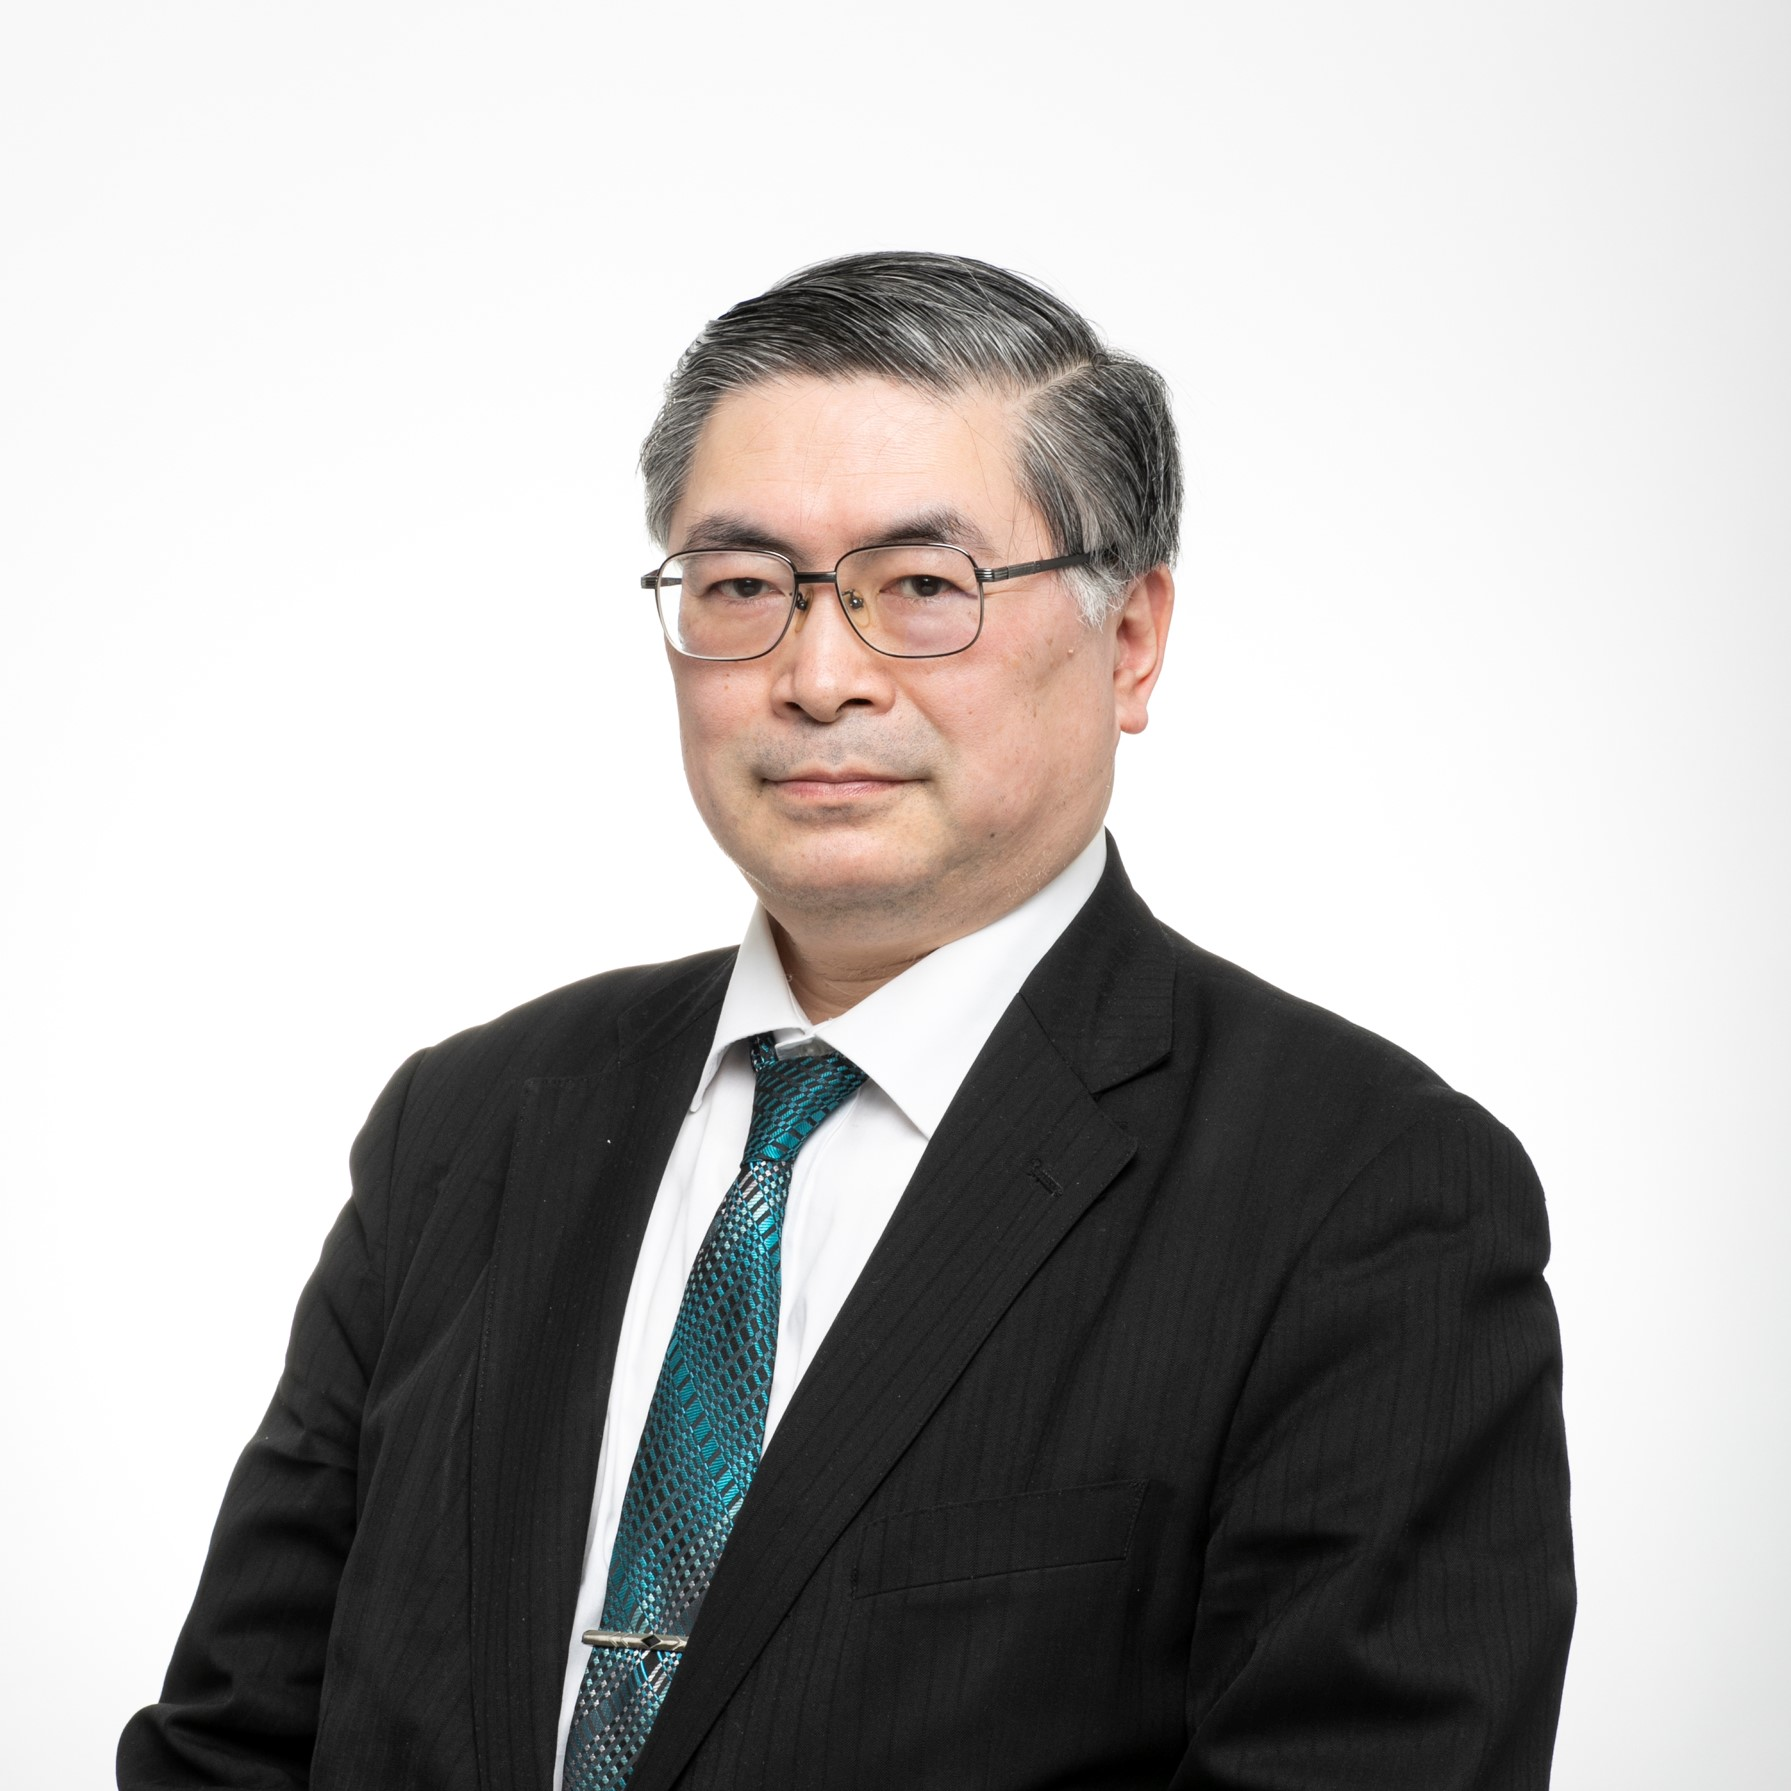 Michinao Morohoshi